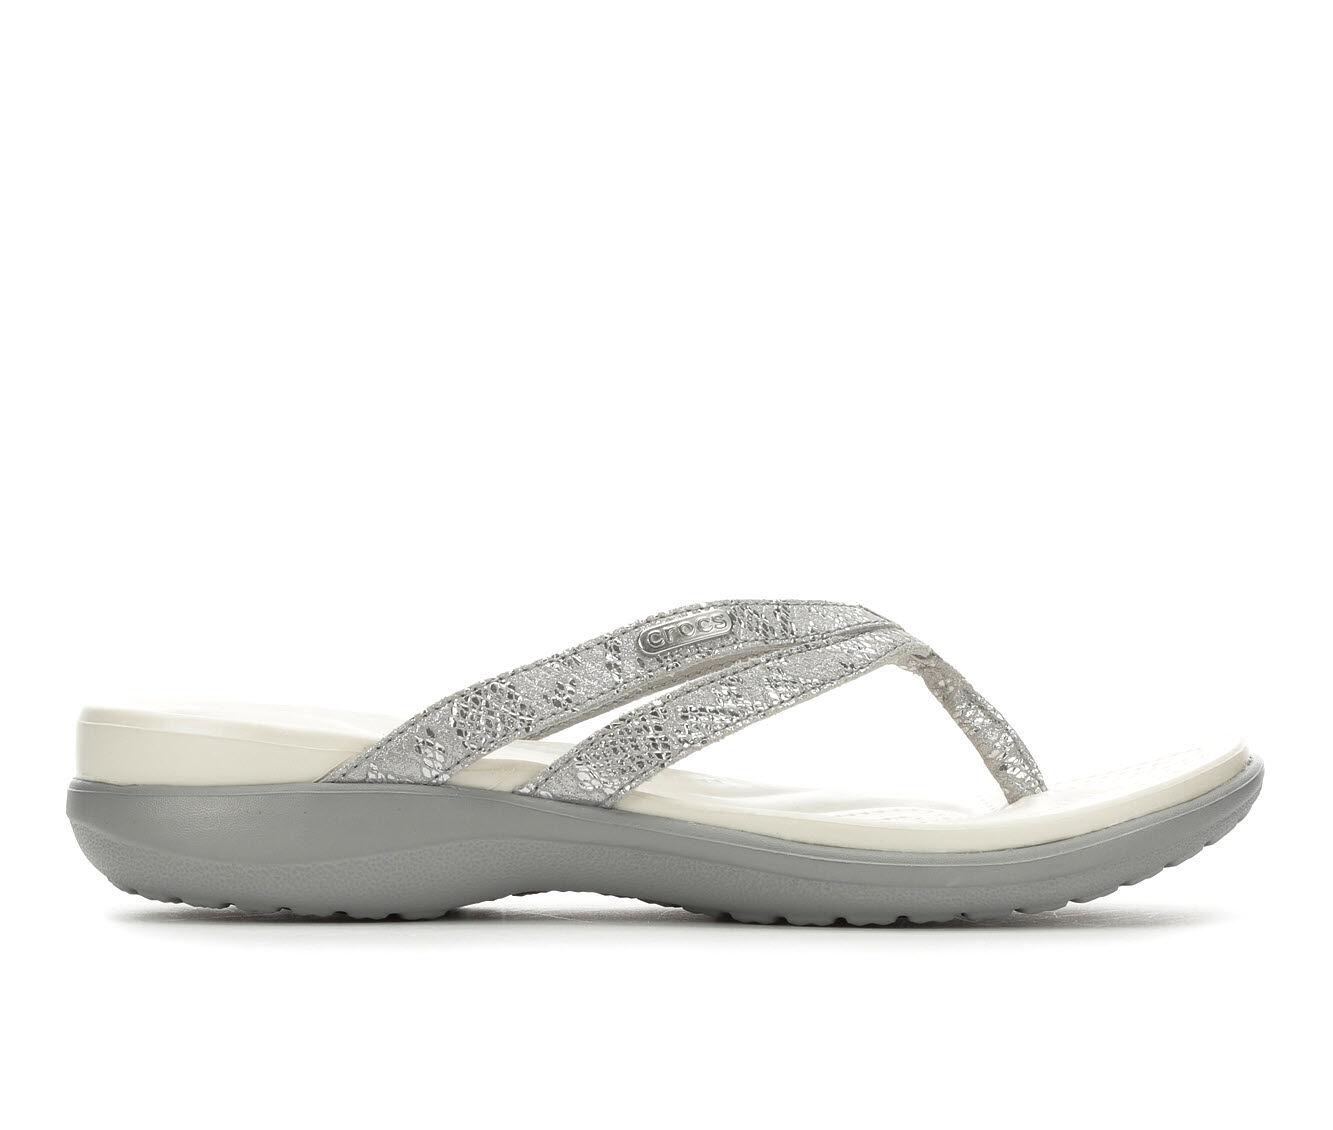 Women's Crocs Capri Metallic Flip Silver/Silver